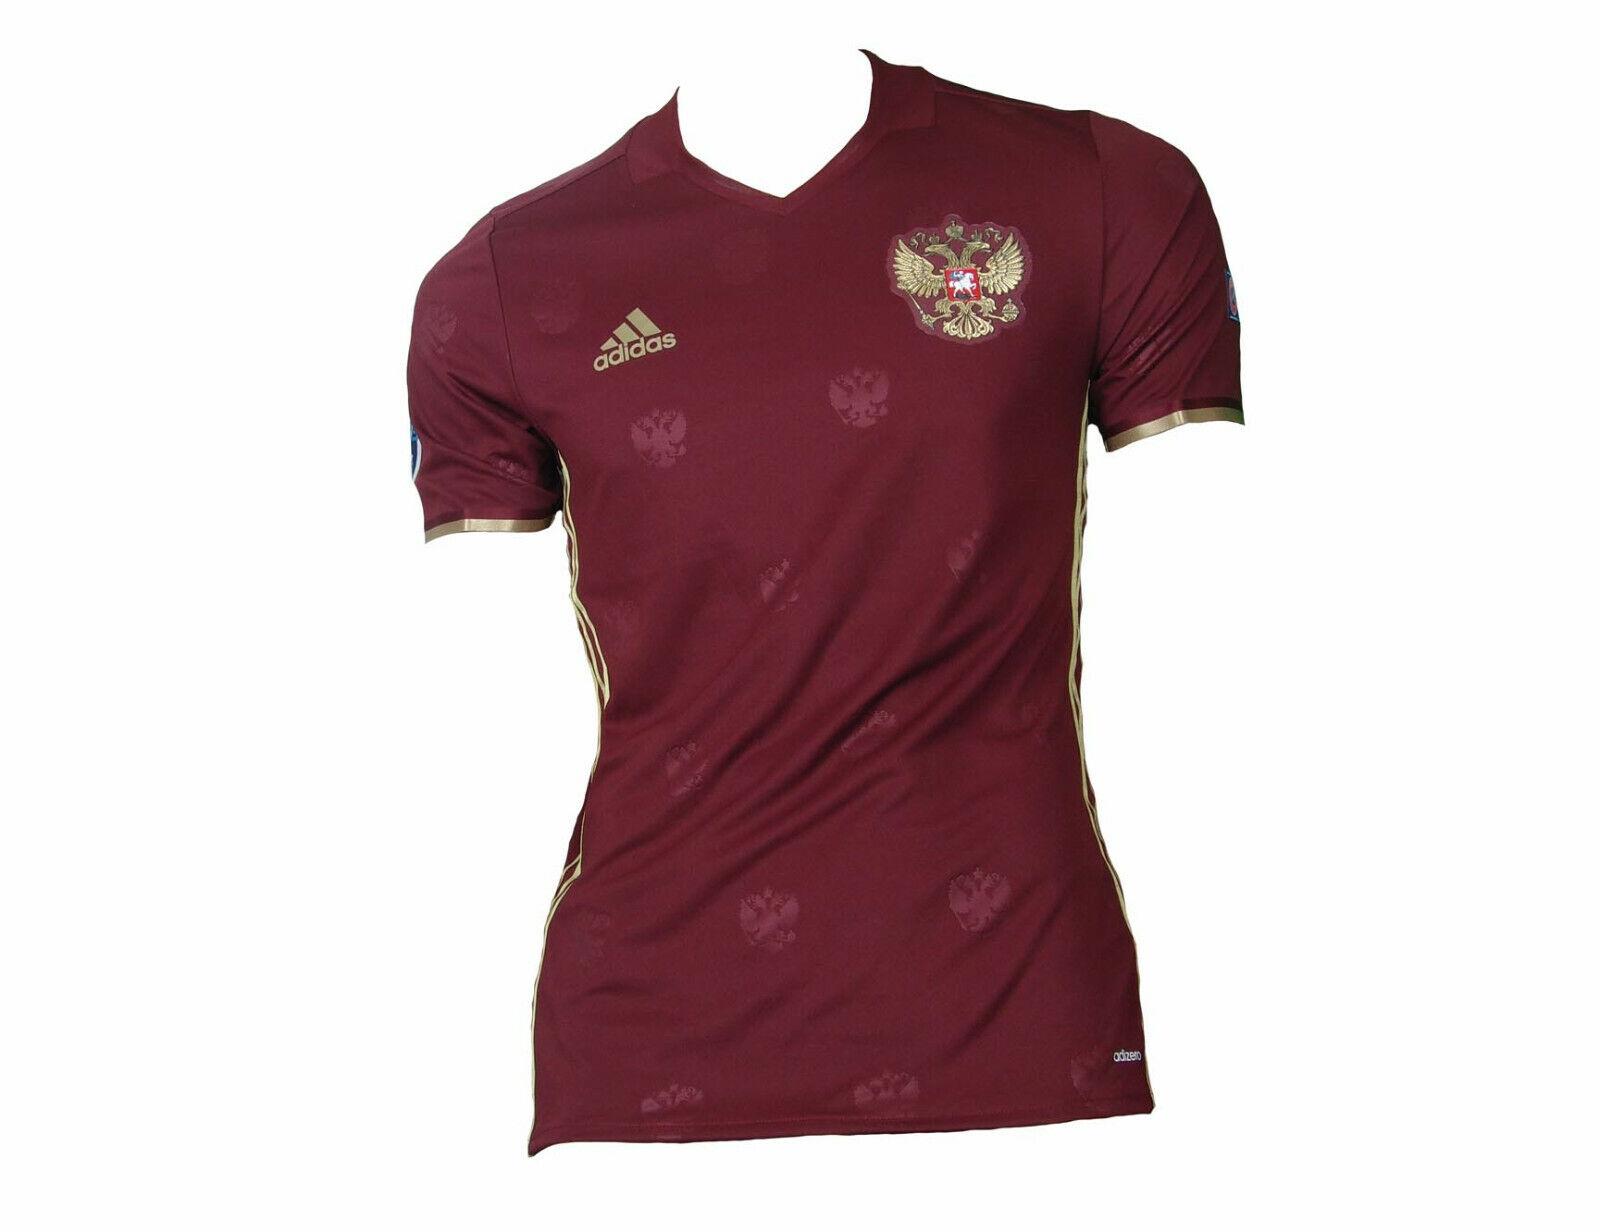 Russland Trikot Nationalmannschaft Adidas 2015 16 Home Adizero Player Issue